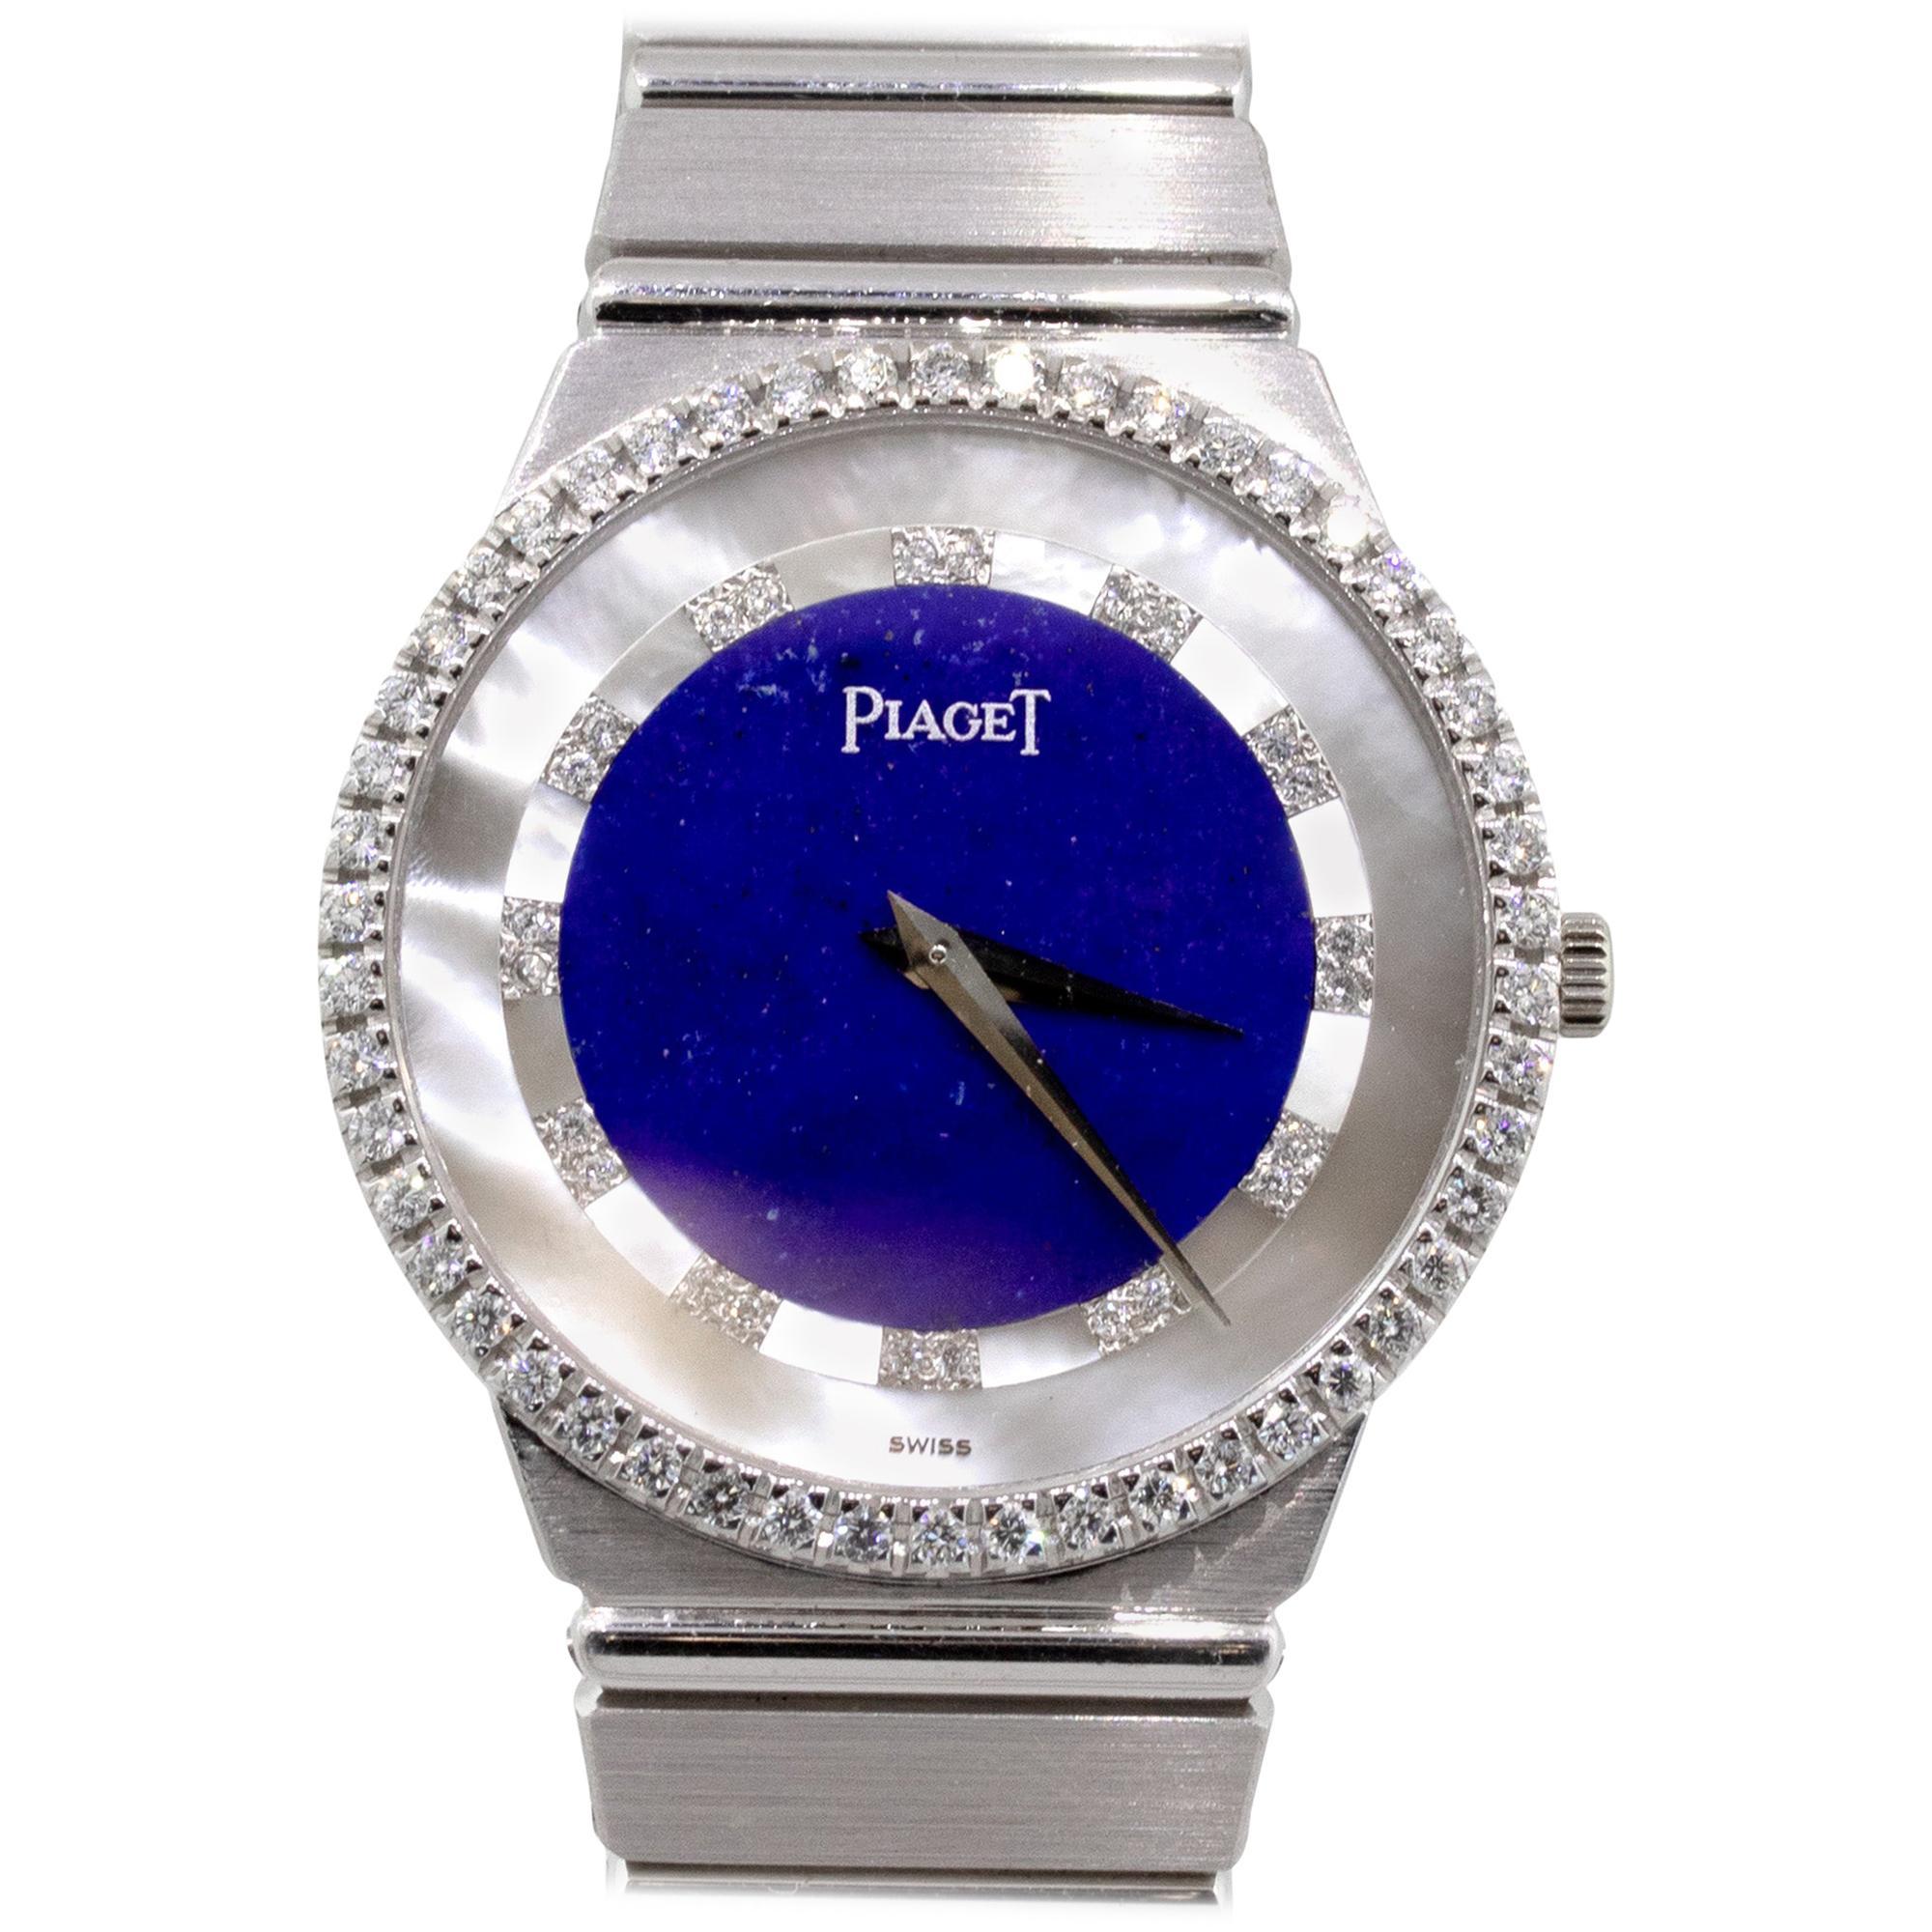 Piaget 18 Karat White Gold Lapis Lazuli and Mother of Pearl Dial Watch